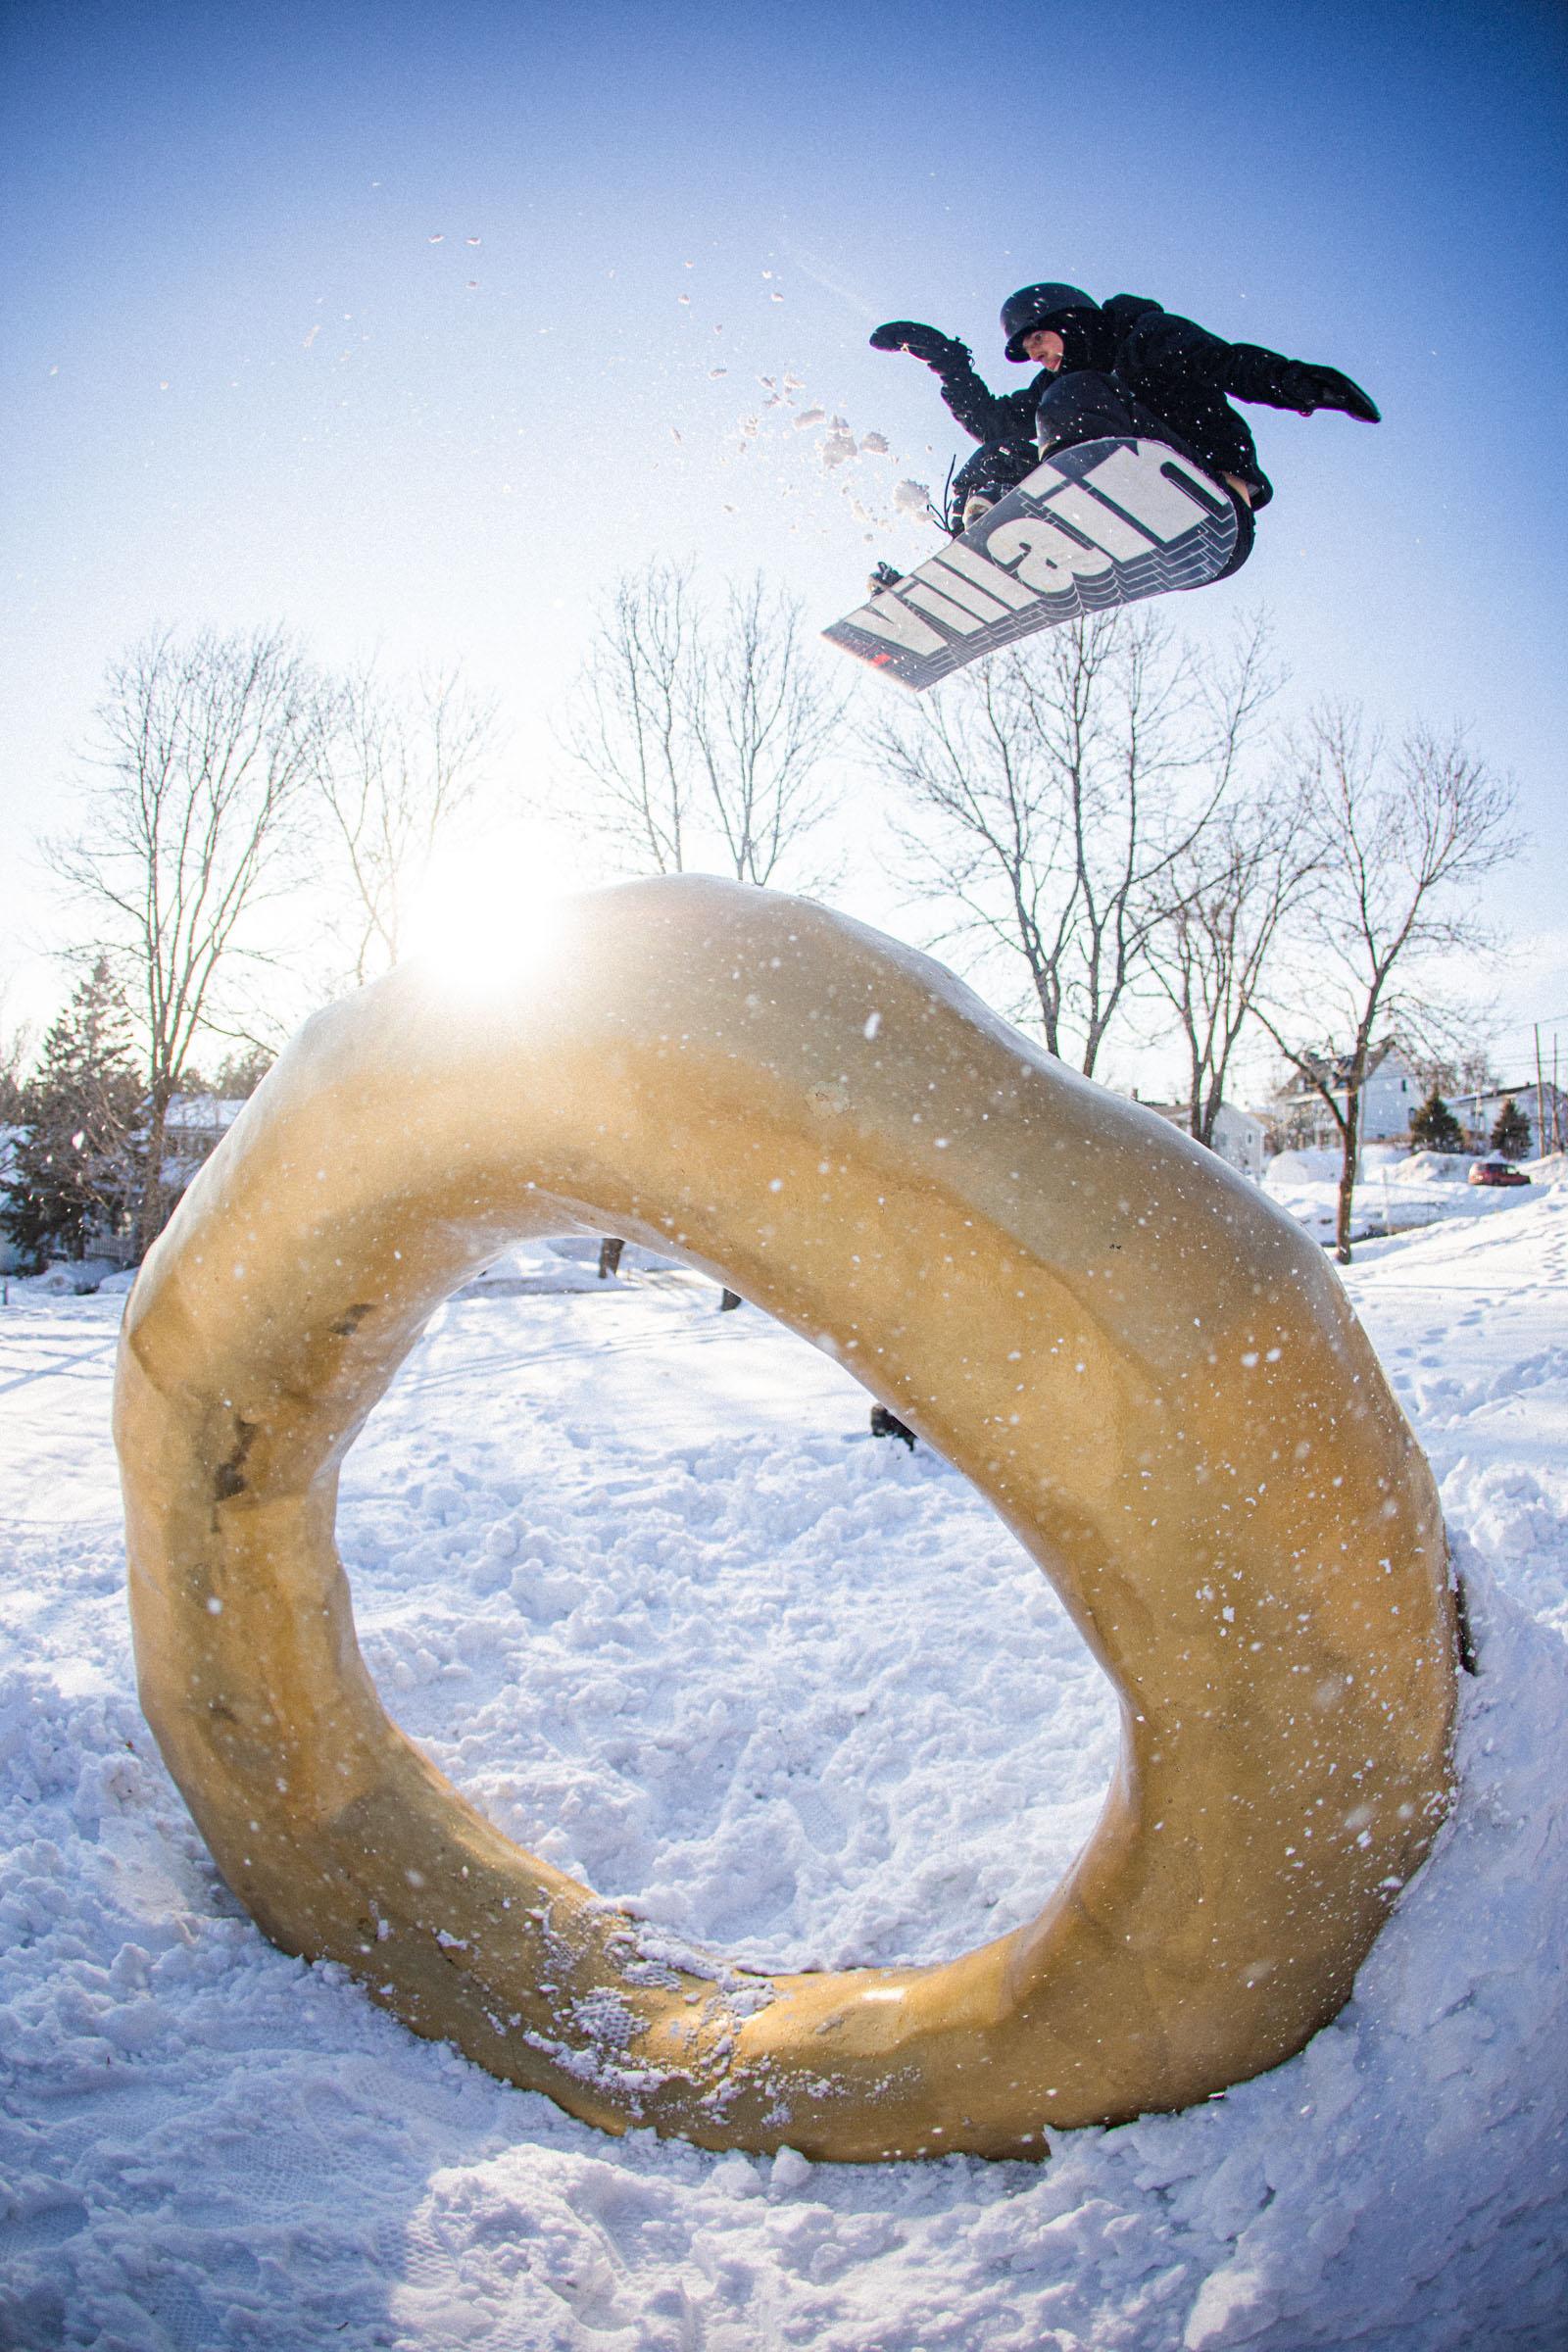 Action - Snowboarding, Canada